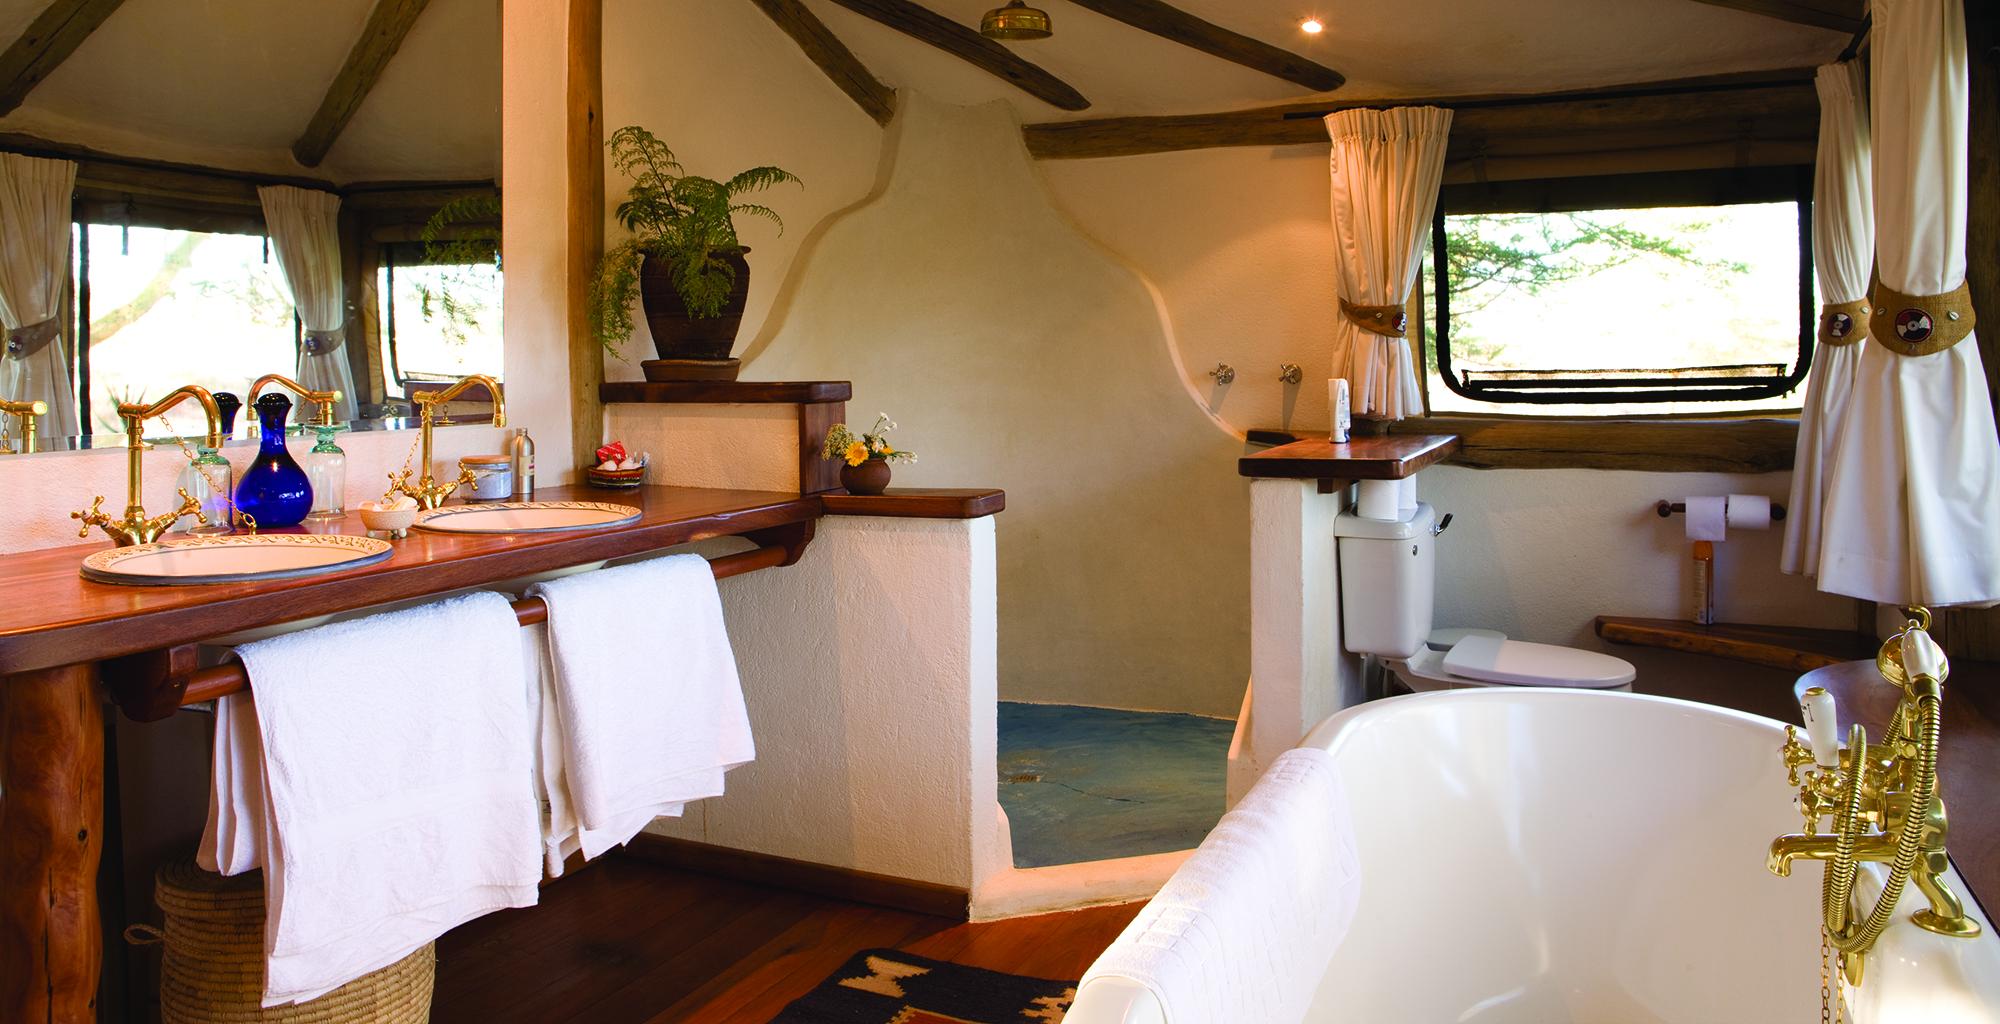 Kenya-Sirikoi-Willies-Camp-Bathroom